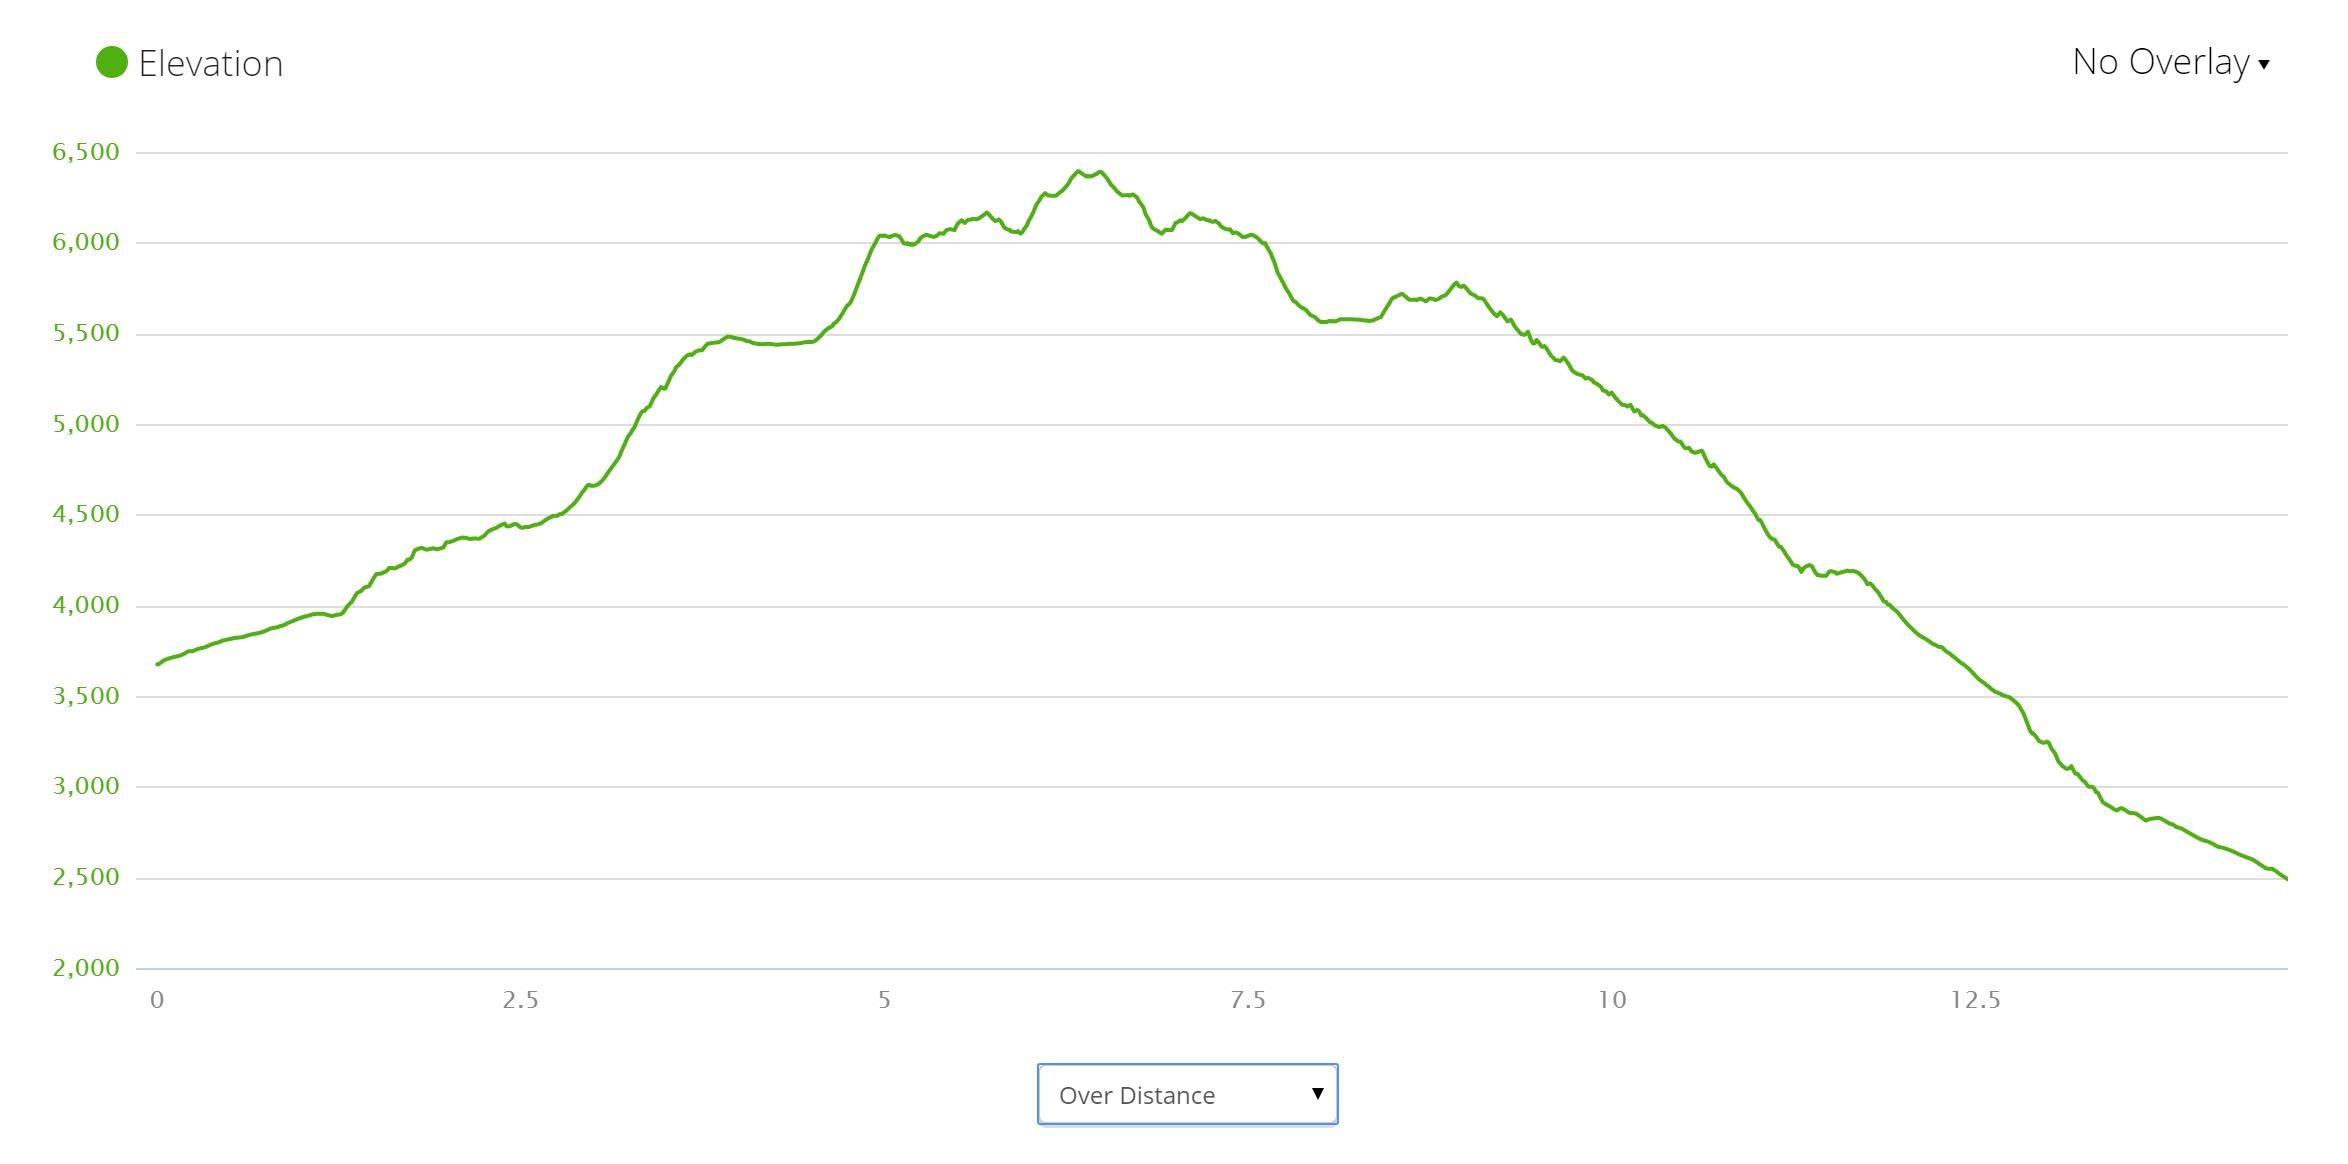 Tongariro Alpine Crossing Elevation Profile